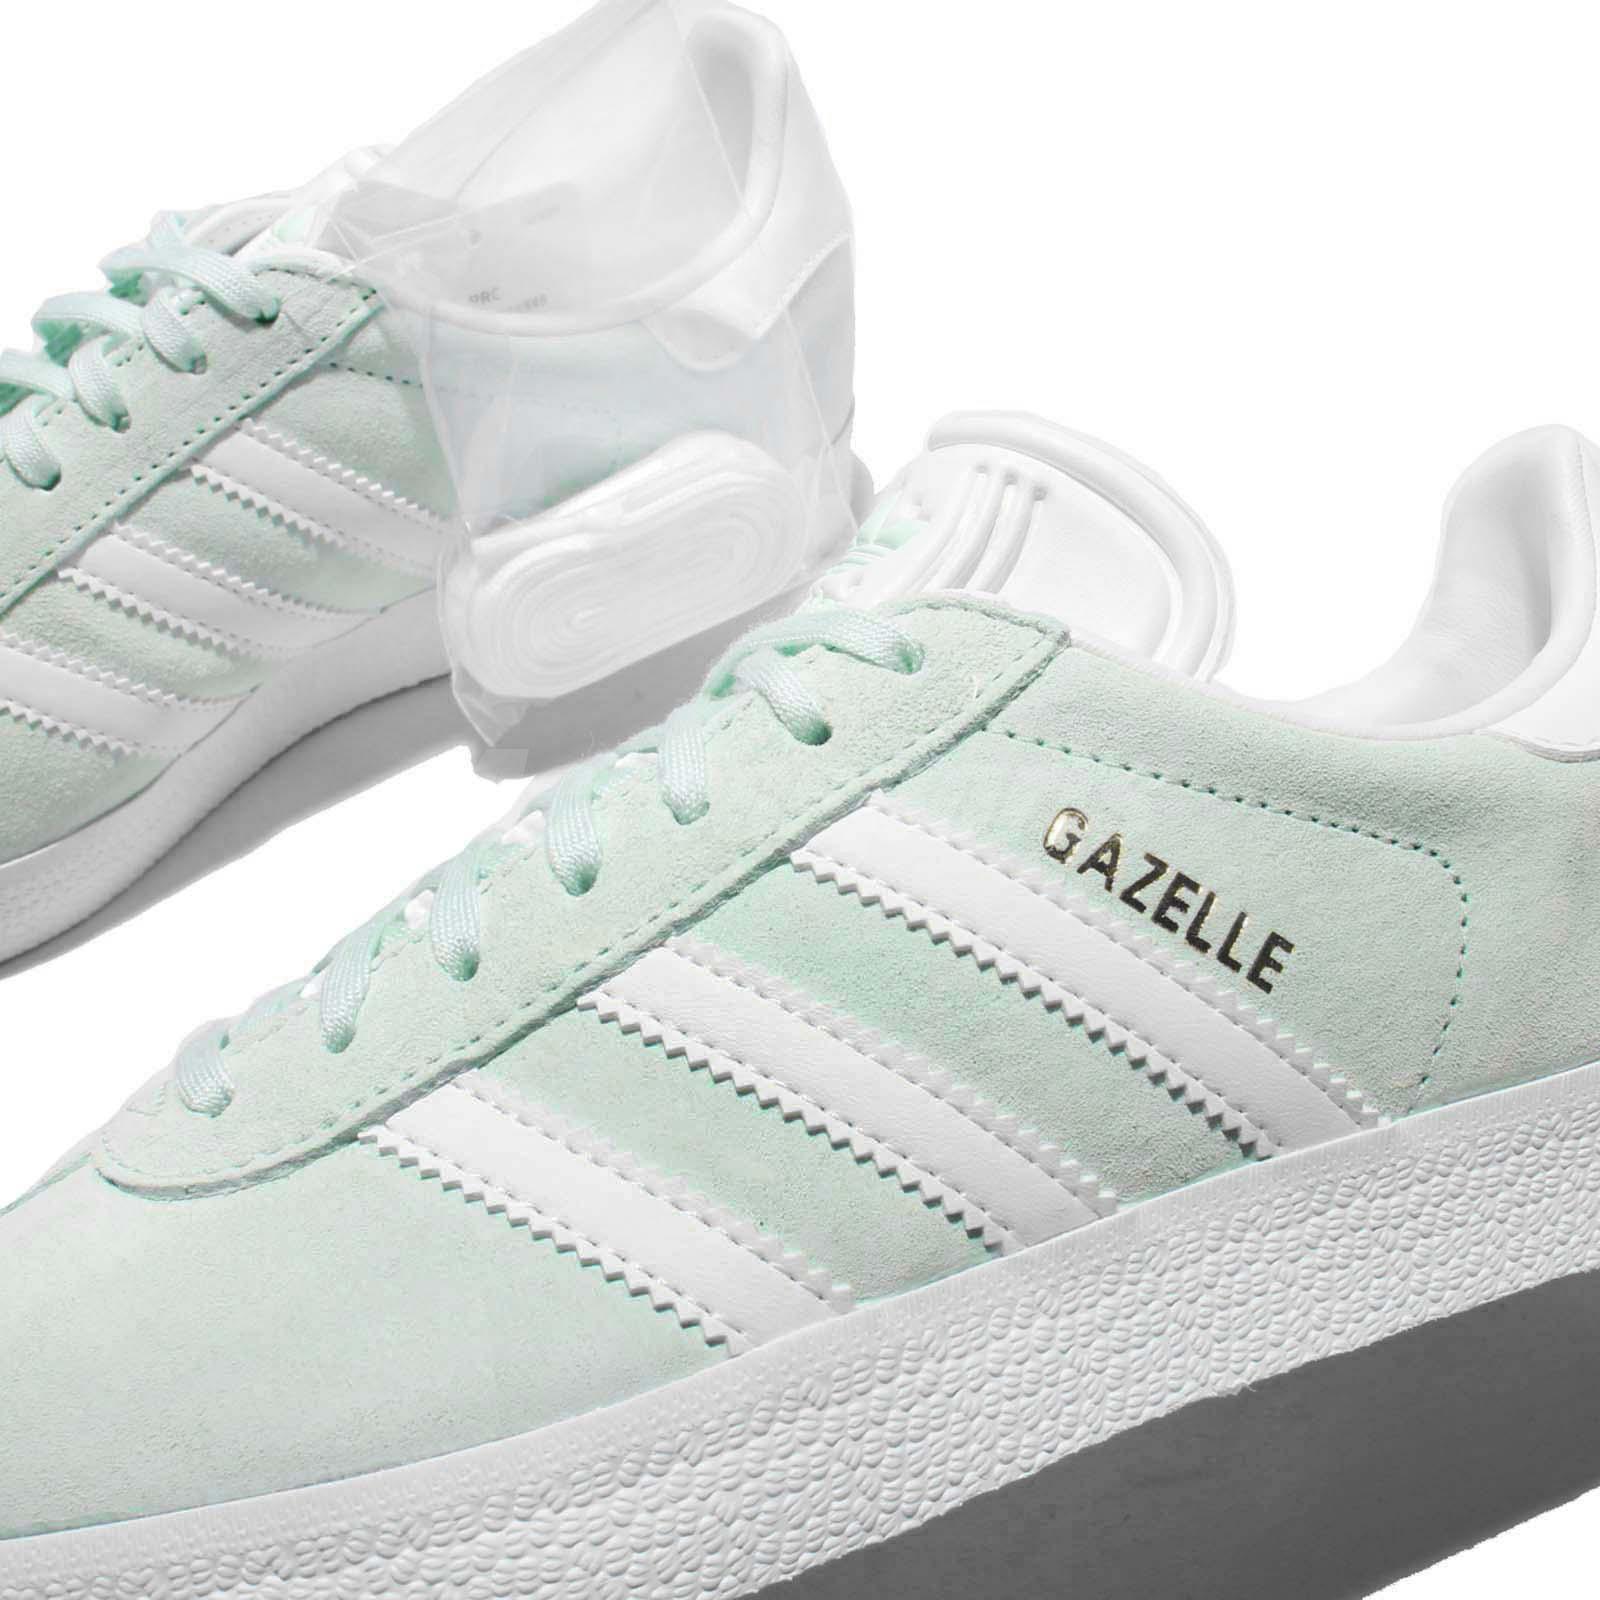 Men's Adidas Gazelle OG Shoes [KE2719LA] Ice Mint Kew Bella